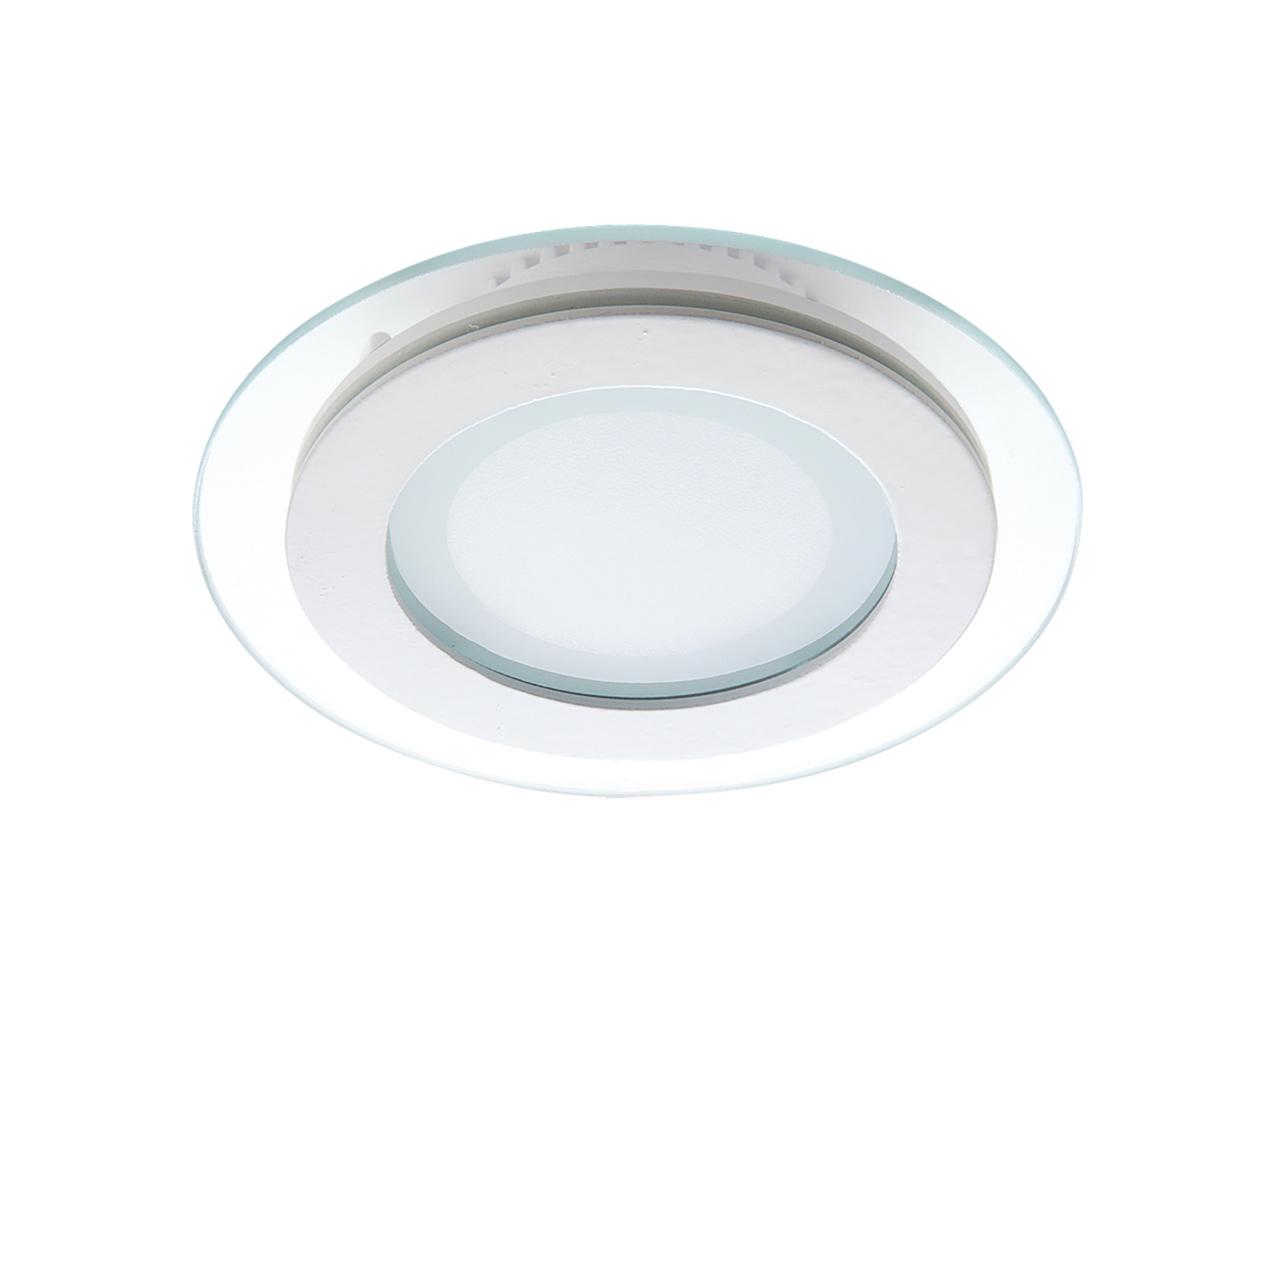 Светильник Acri LED 6W 480LM хром / прозрачный 3000K Lightstar 212010